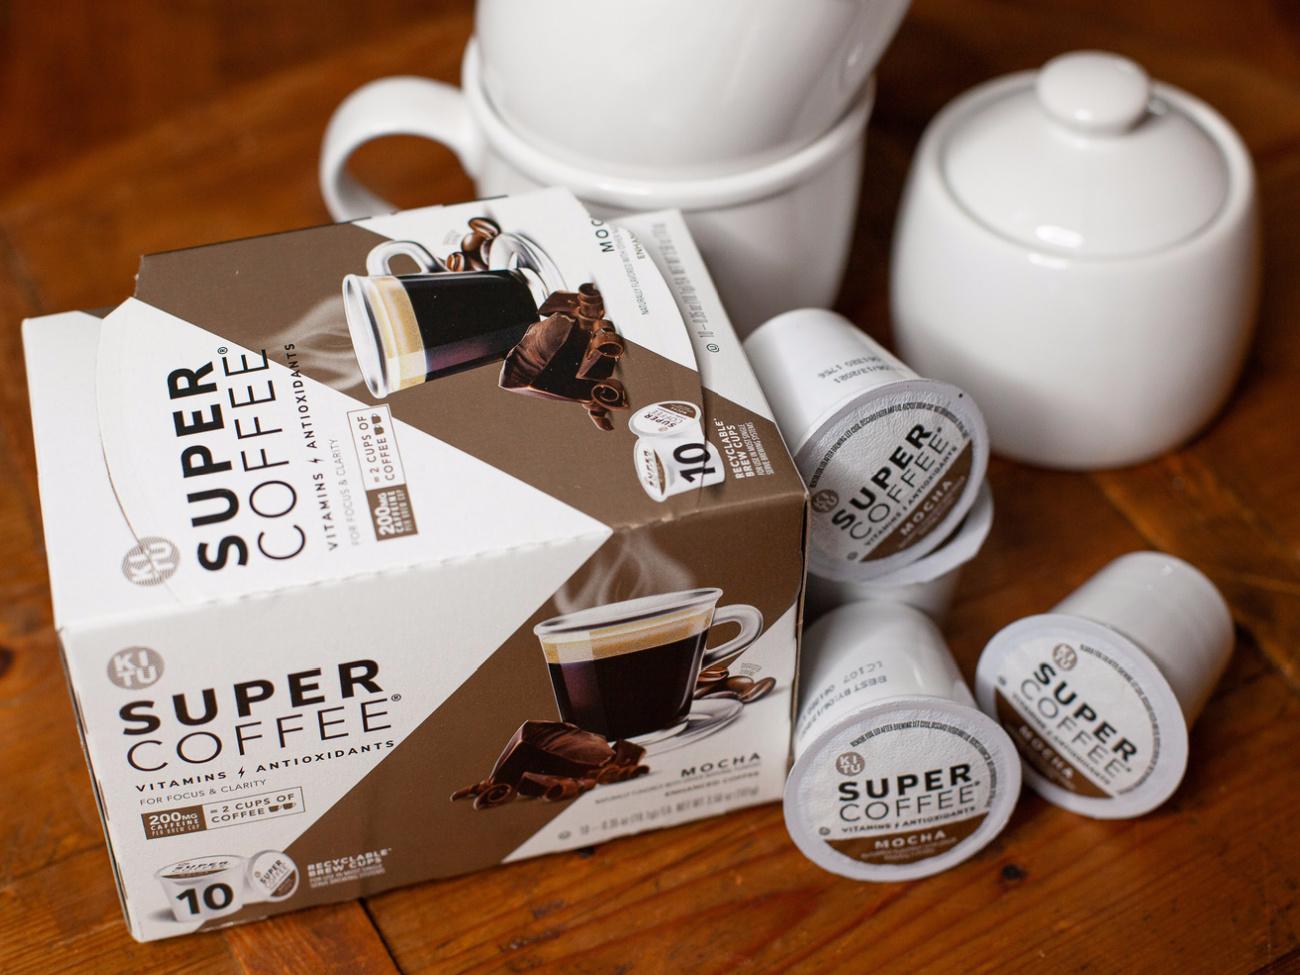 Super Coffee As Low As $1 Per Bottle At Publix on I Heart Publix 2